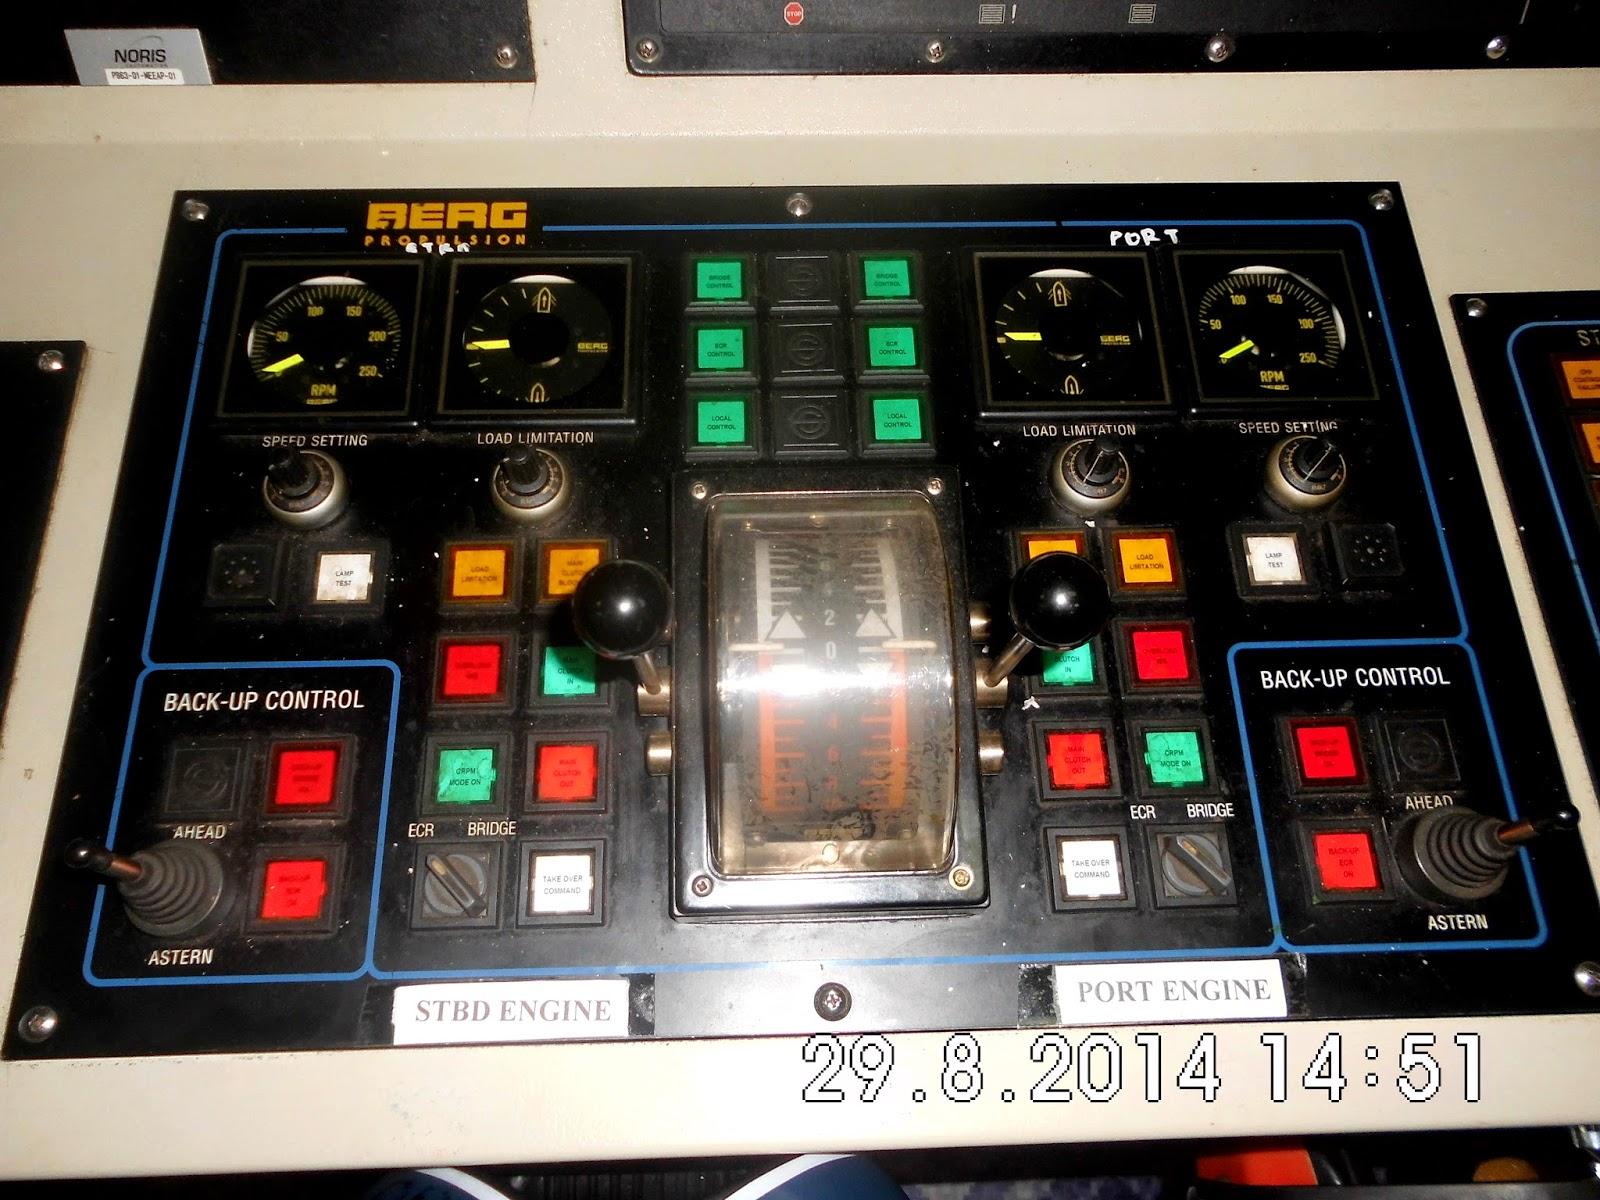 Engine Remote Control System ERC300 CP